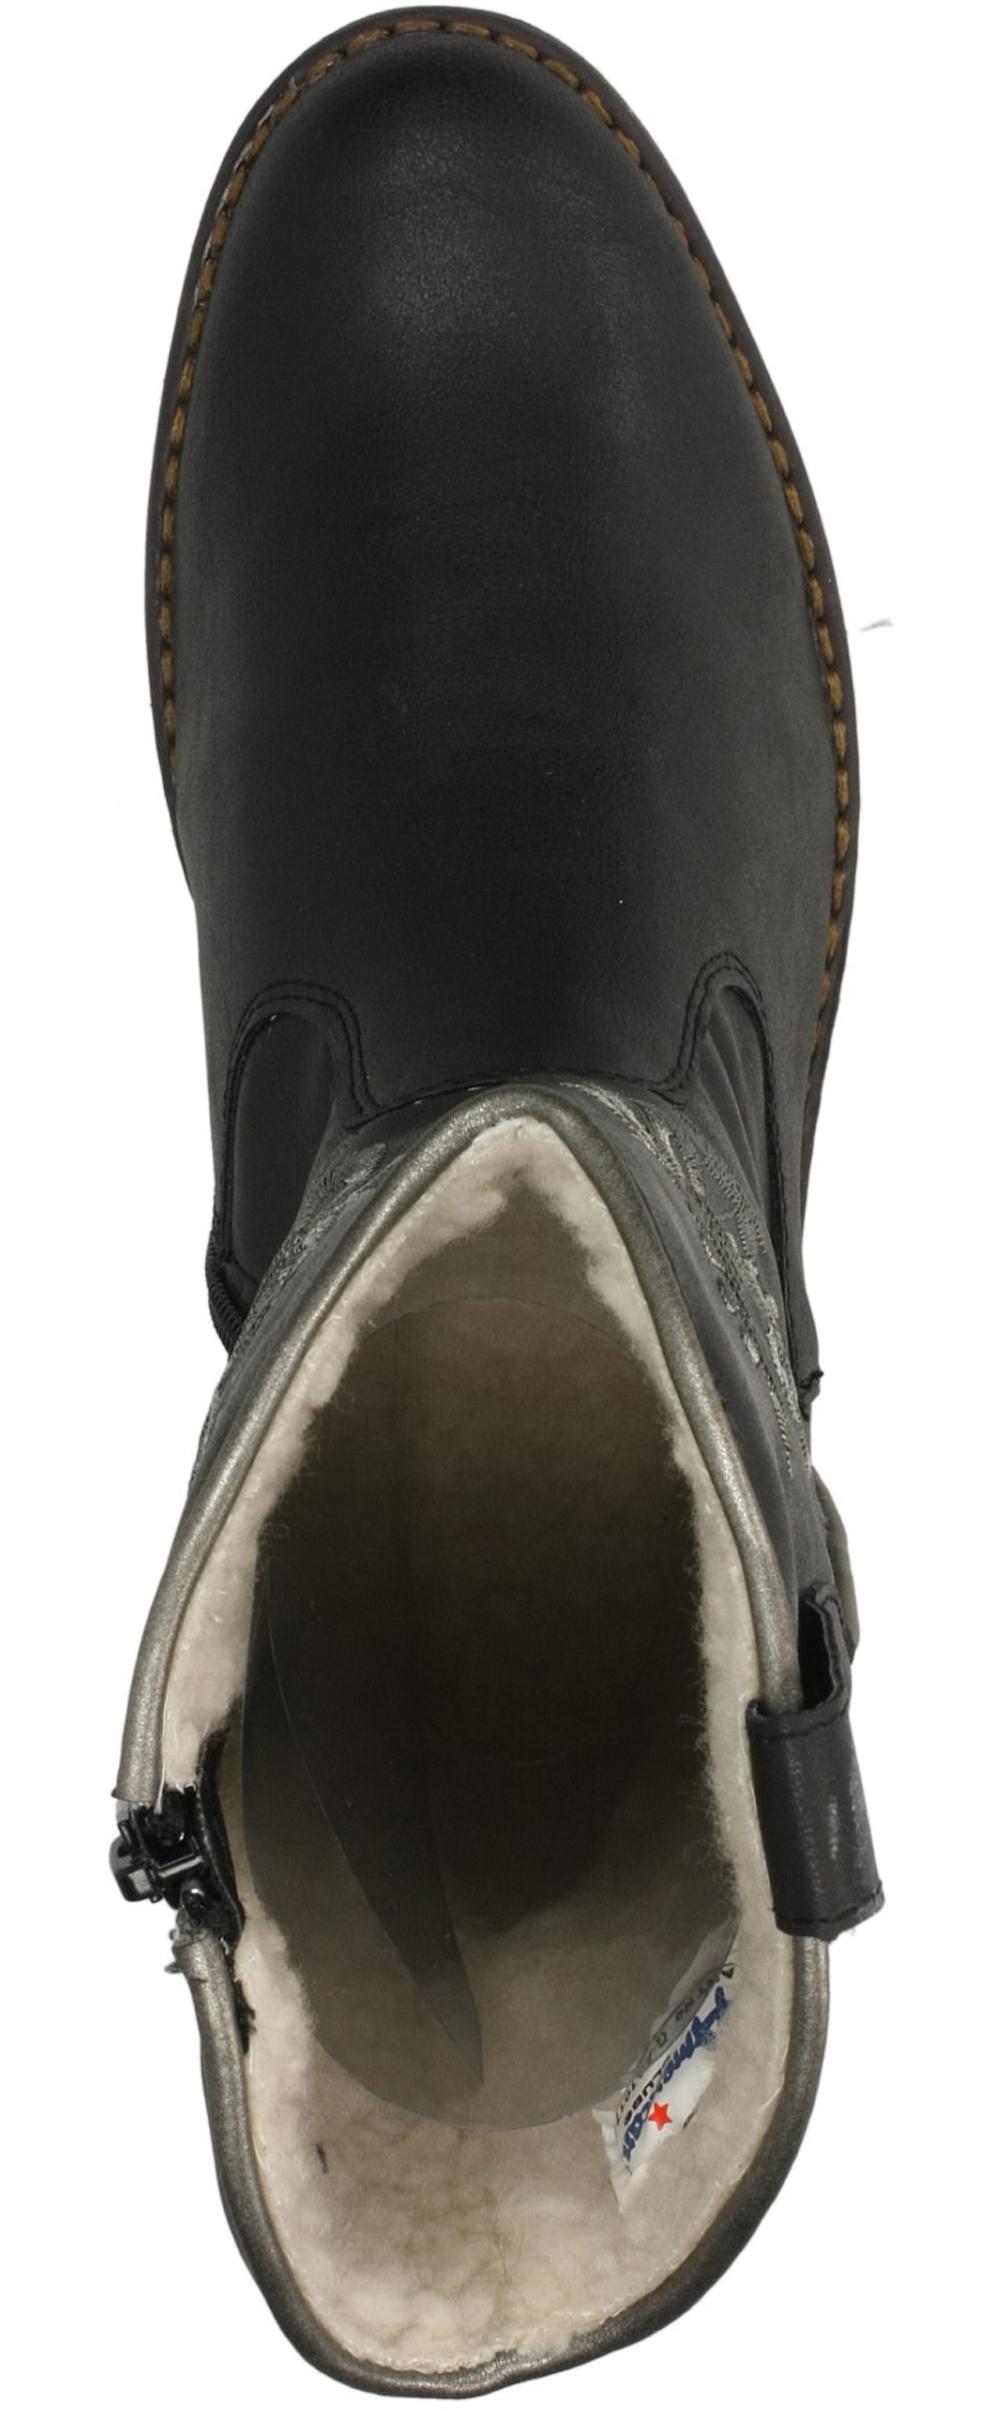 KOZAKI AMERICAN G-AA10174 kolor czarny